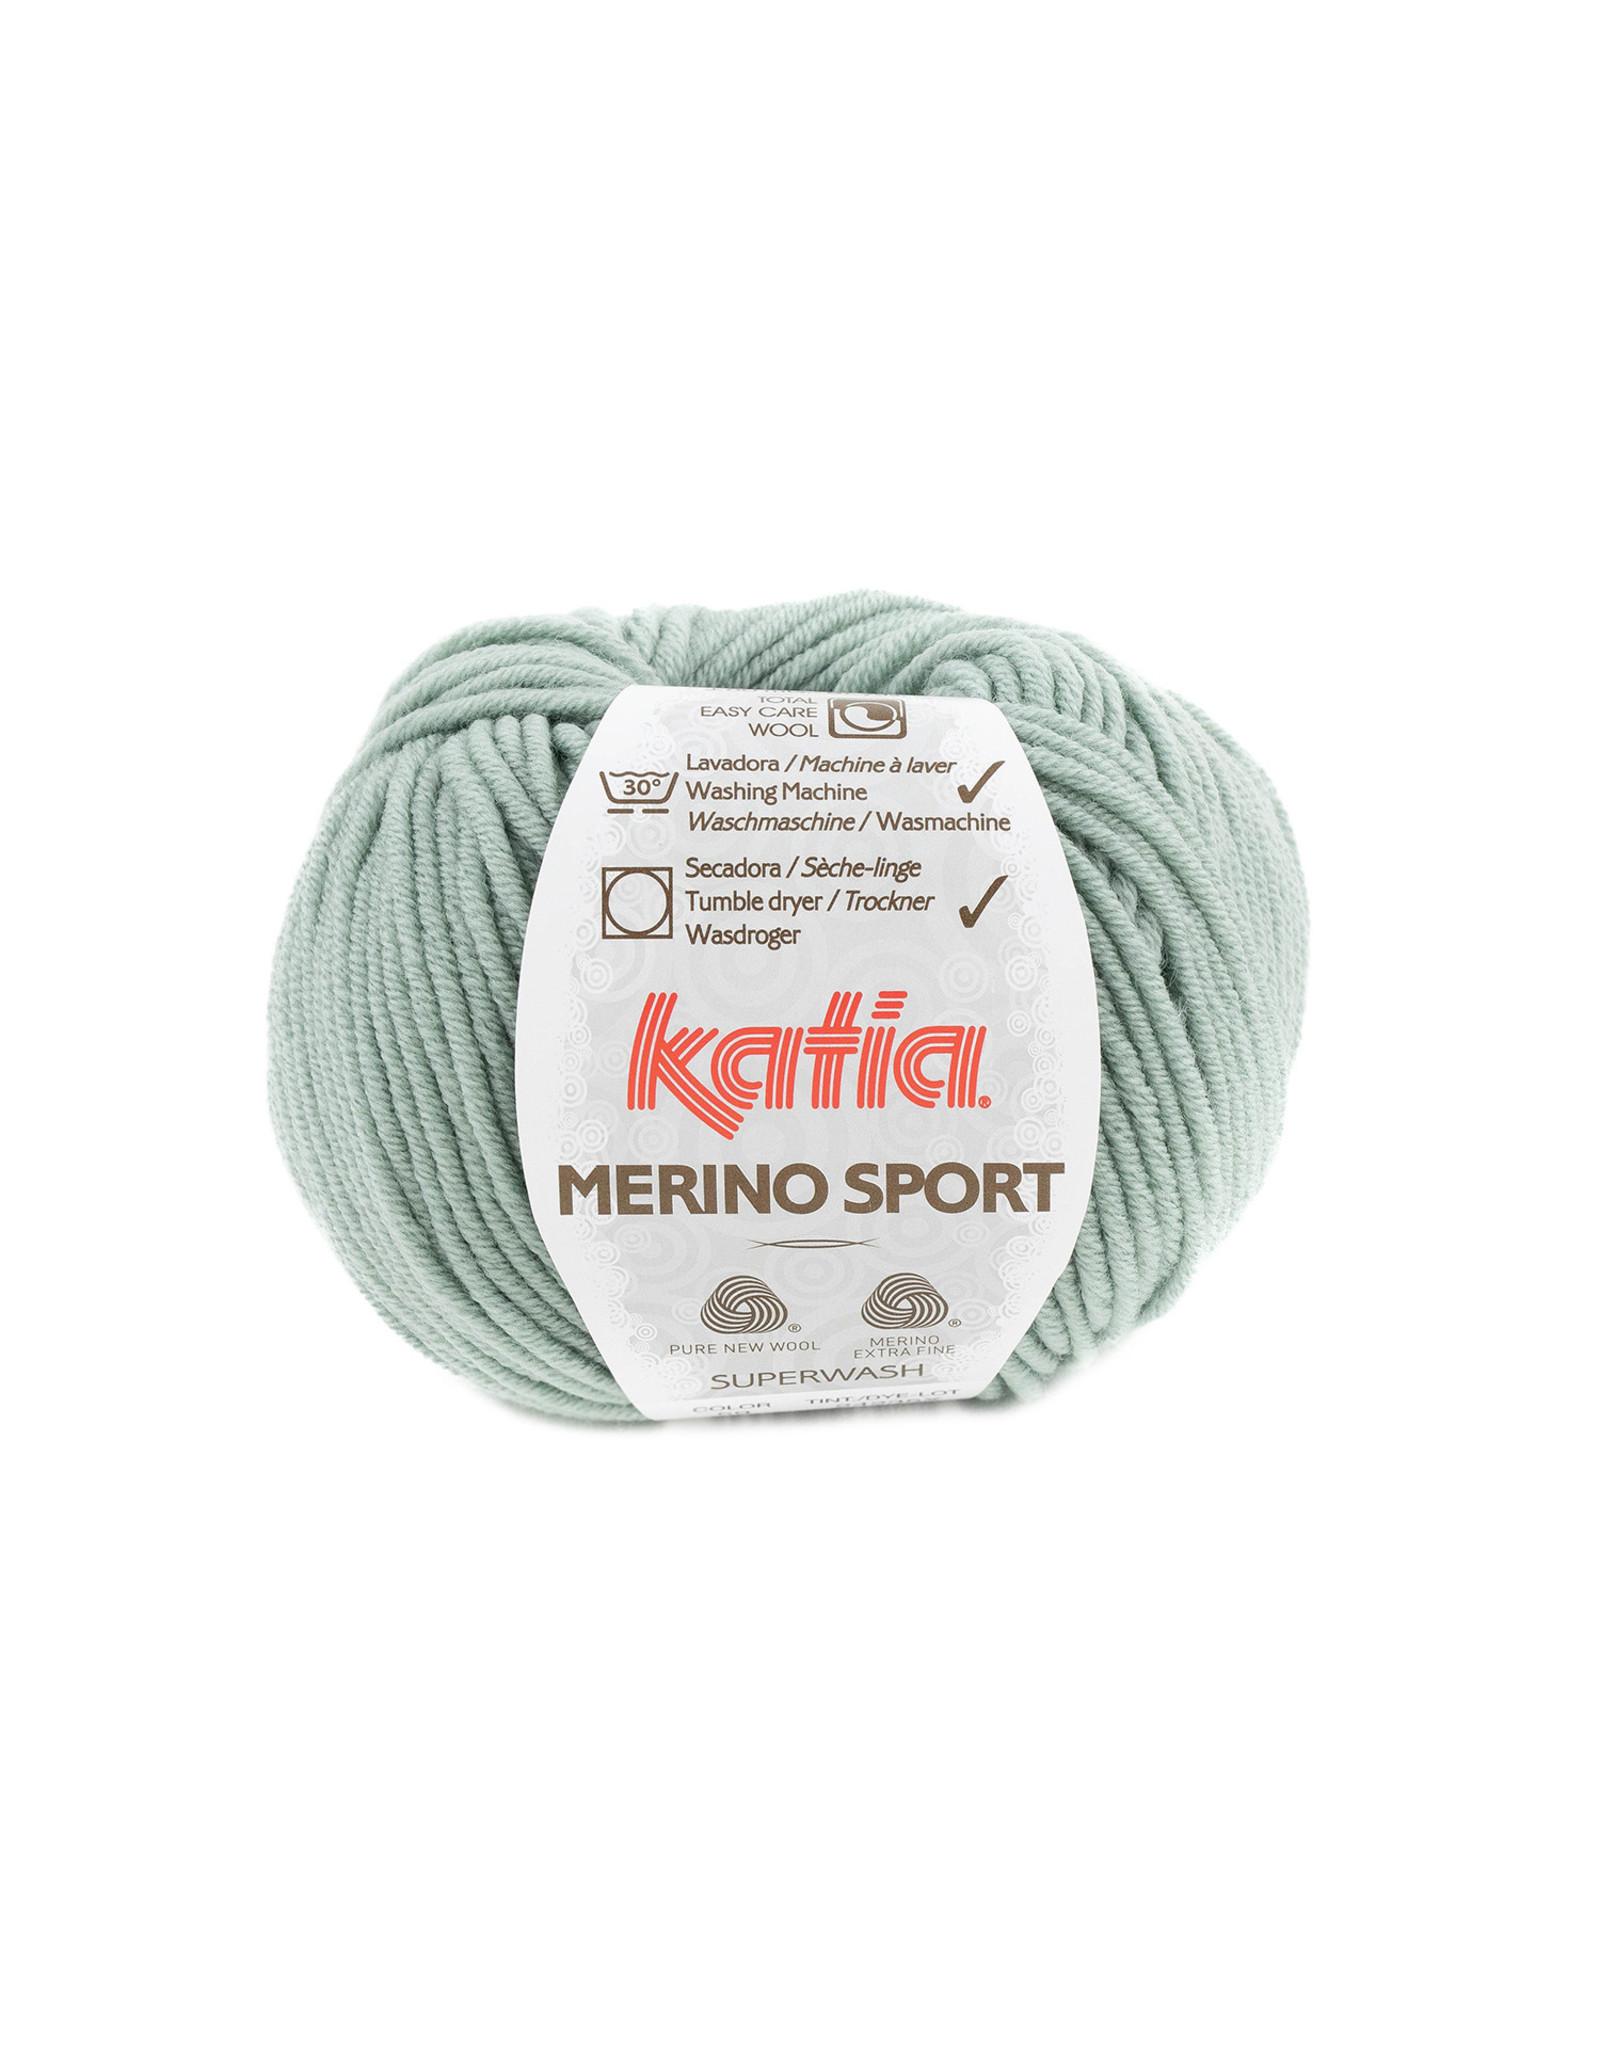 Katia Katia - Merino Sport - 59 Resedagroen - 50 gr.